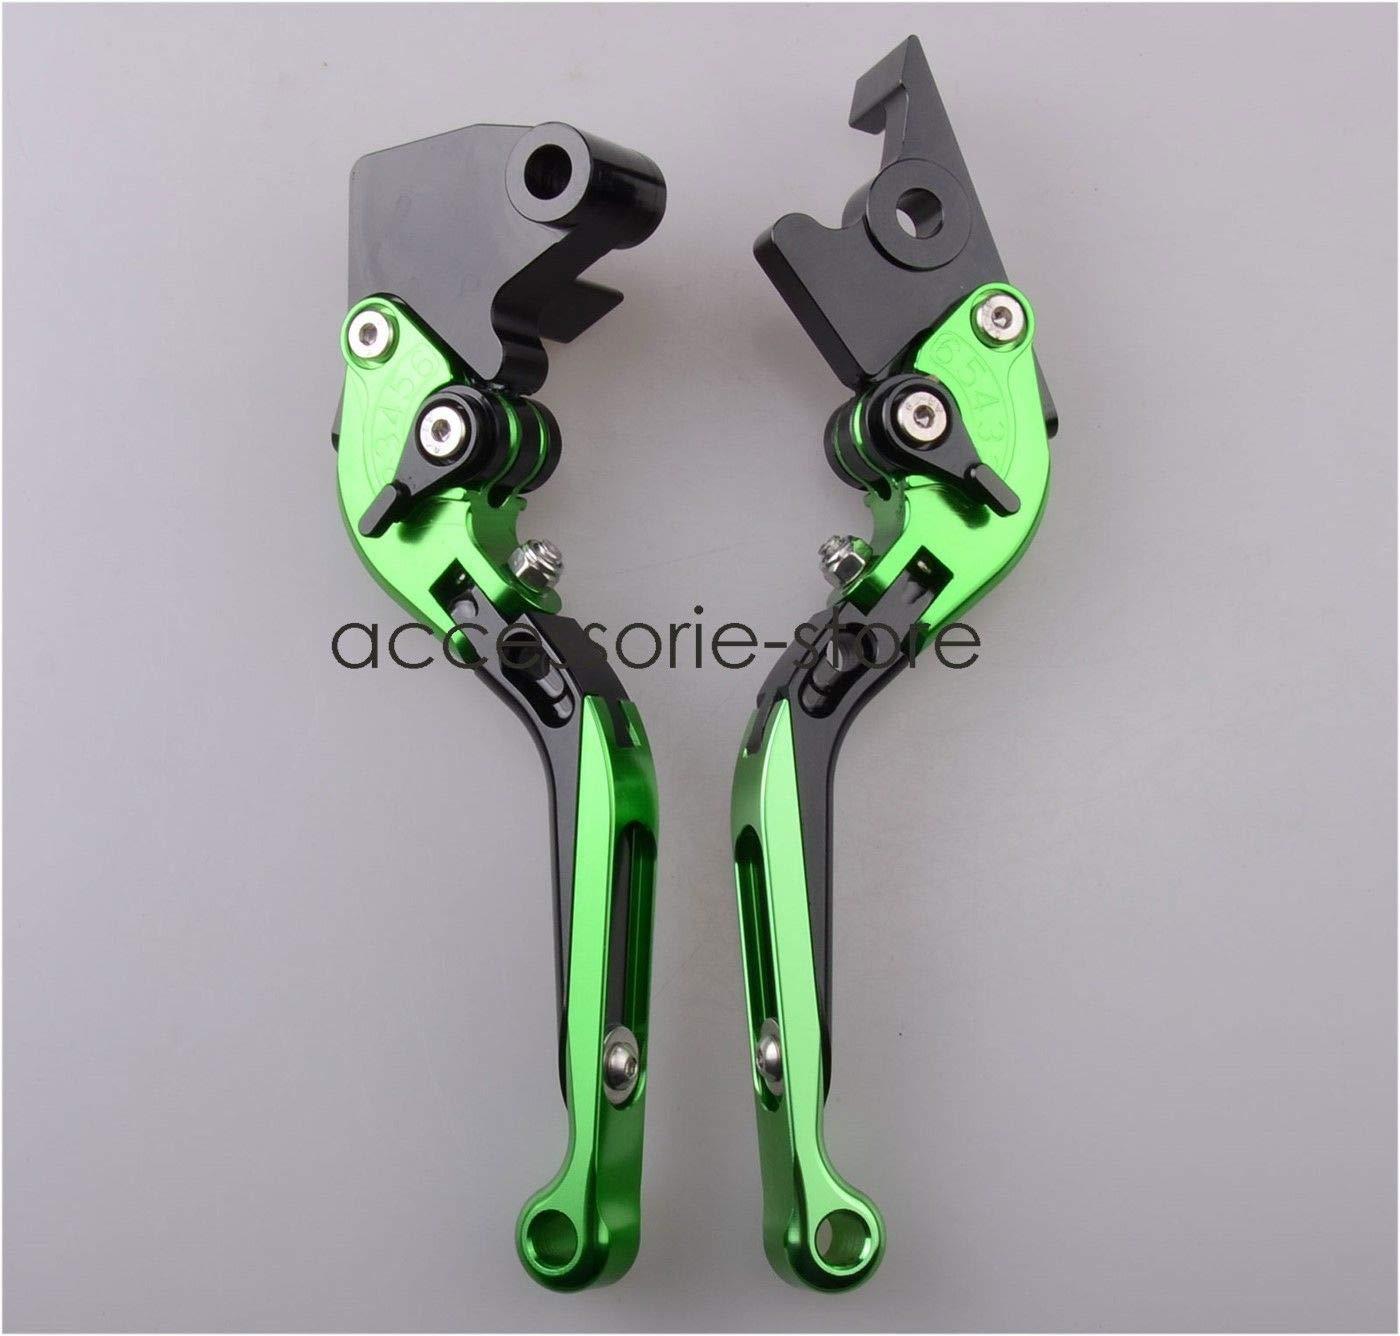 Amazon.com: FidgetFidget Folding Extending Clutch Brake ...